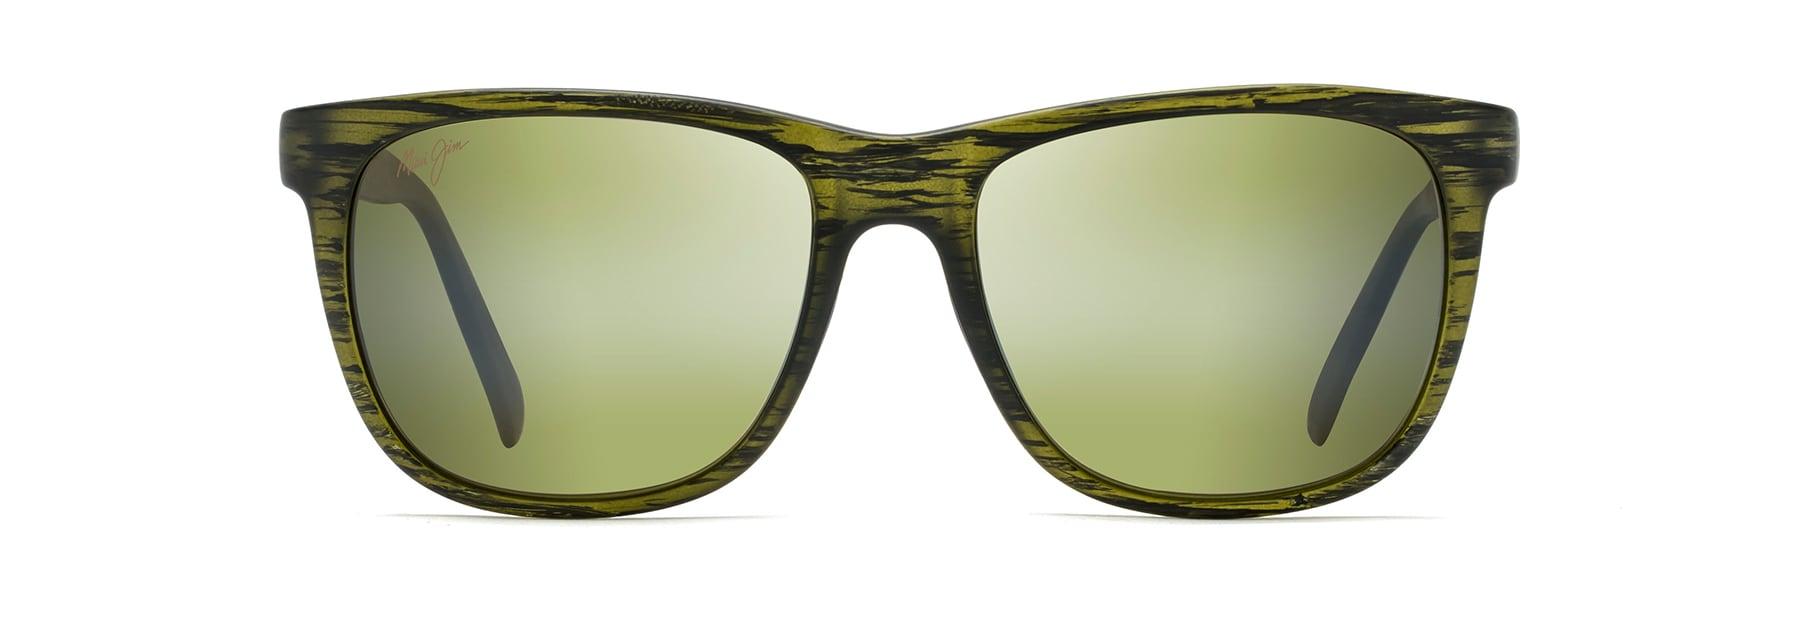 4a3a240cf16e Tail Slide Polarized Sunglasses   Maui Jim®